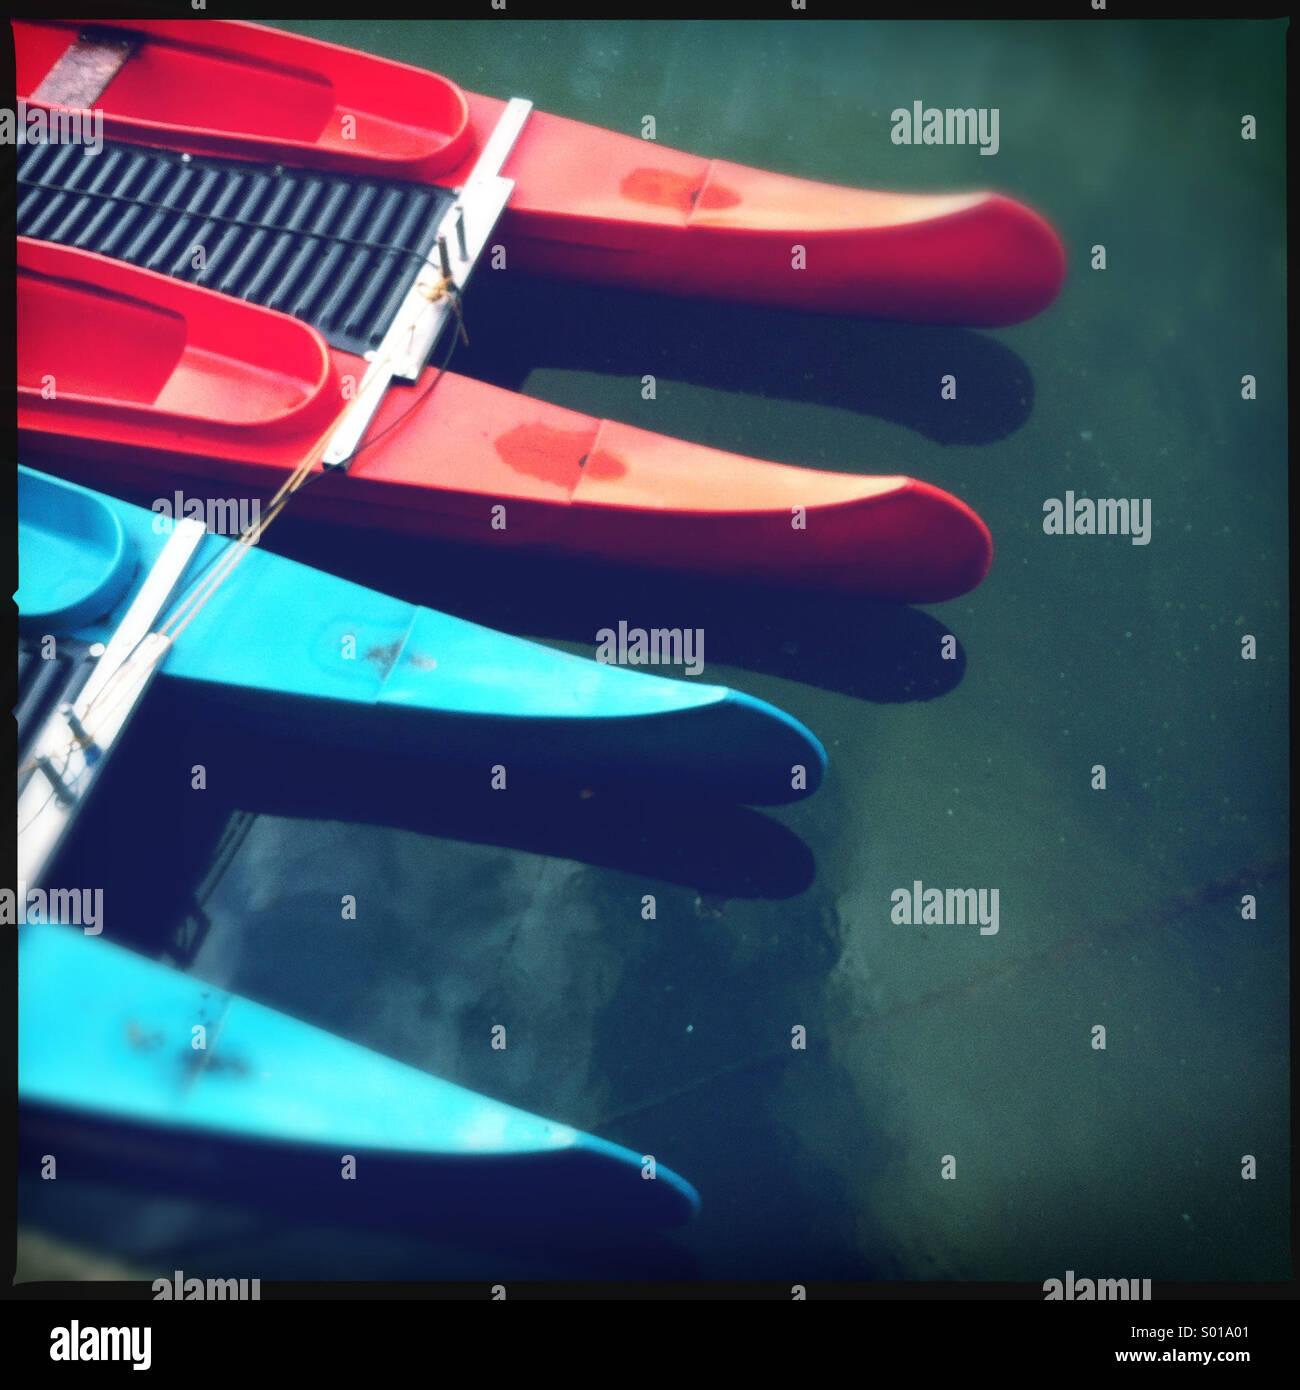 Colourful kayaks - Stock Image